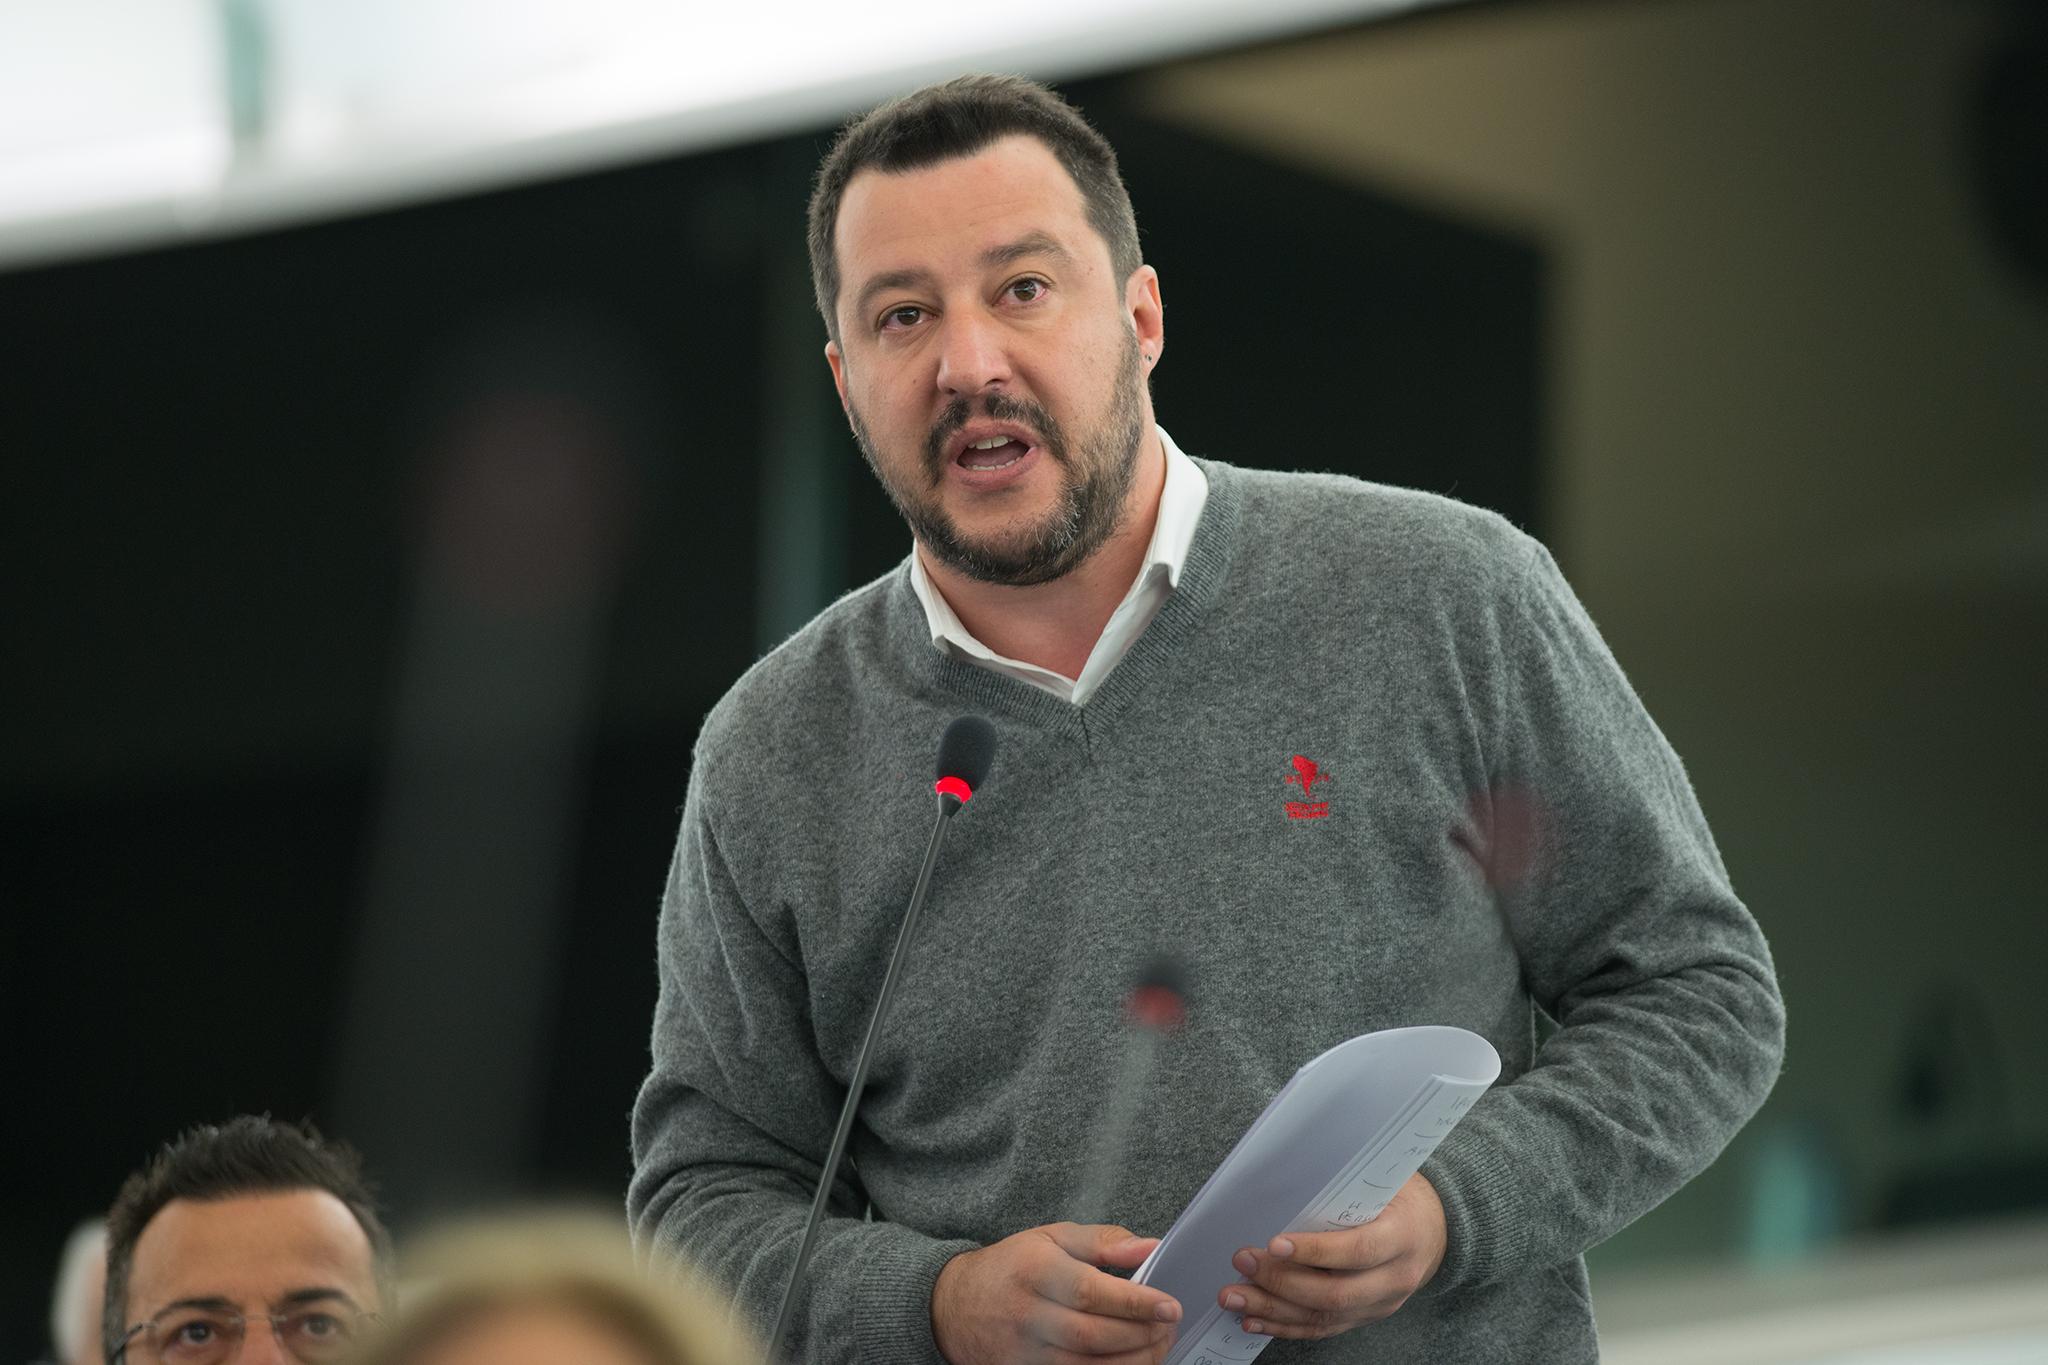 Předseda italské strany Lega Nord (Liga Severu) Matteo Salvini